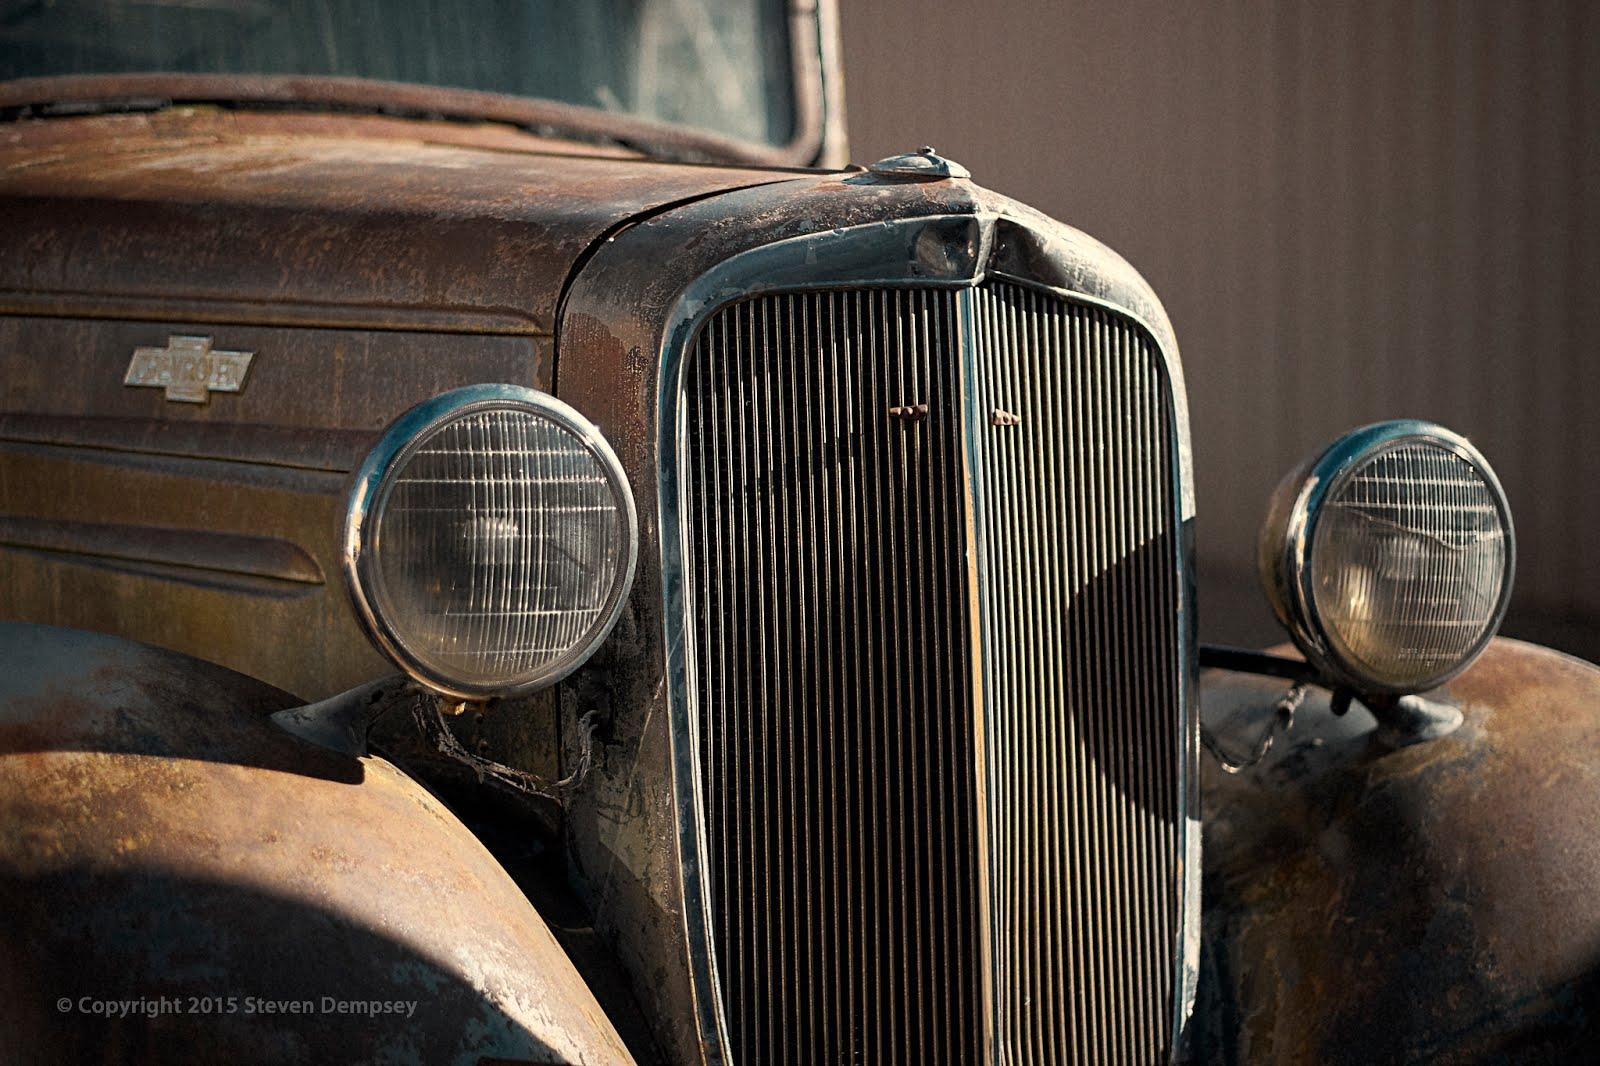 Erie Street Americana In Bisbee Arizona Steven Dempsey On - Bisbee car show